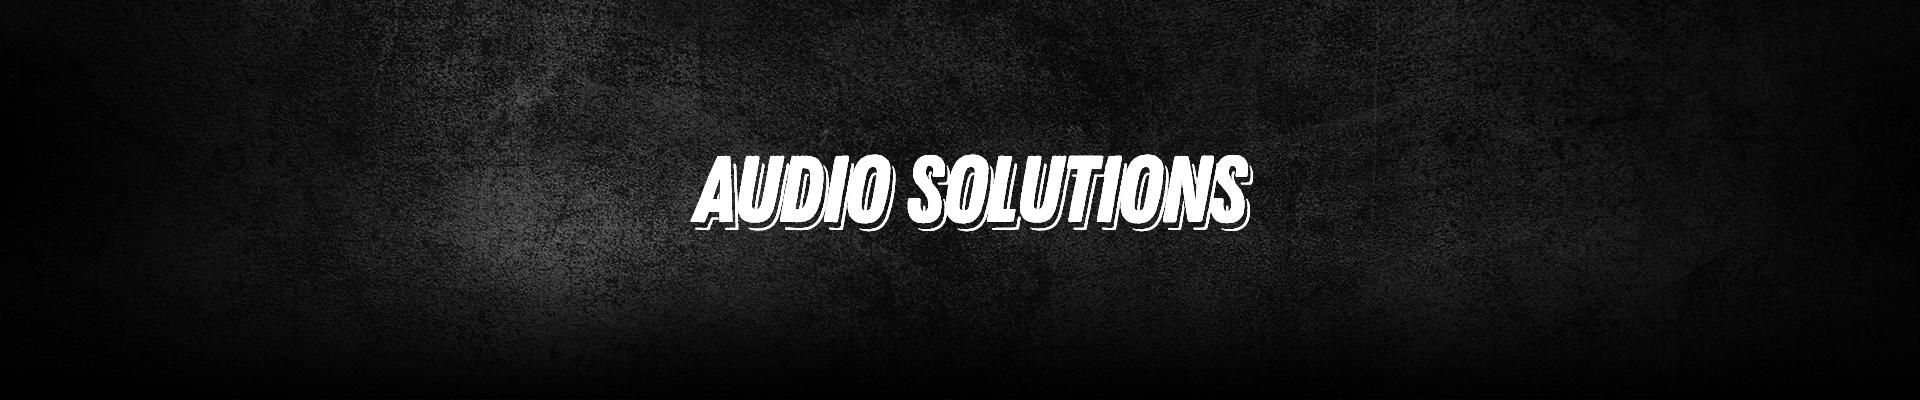 audio-solutions.jpg